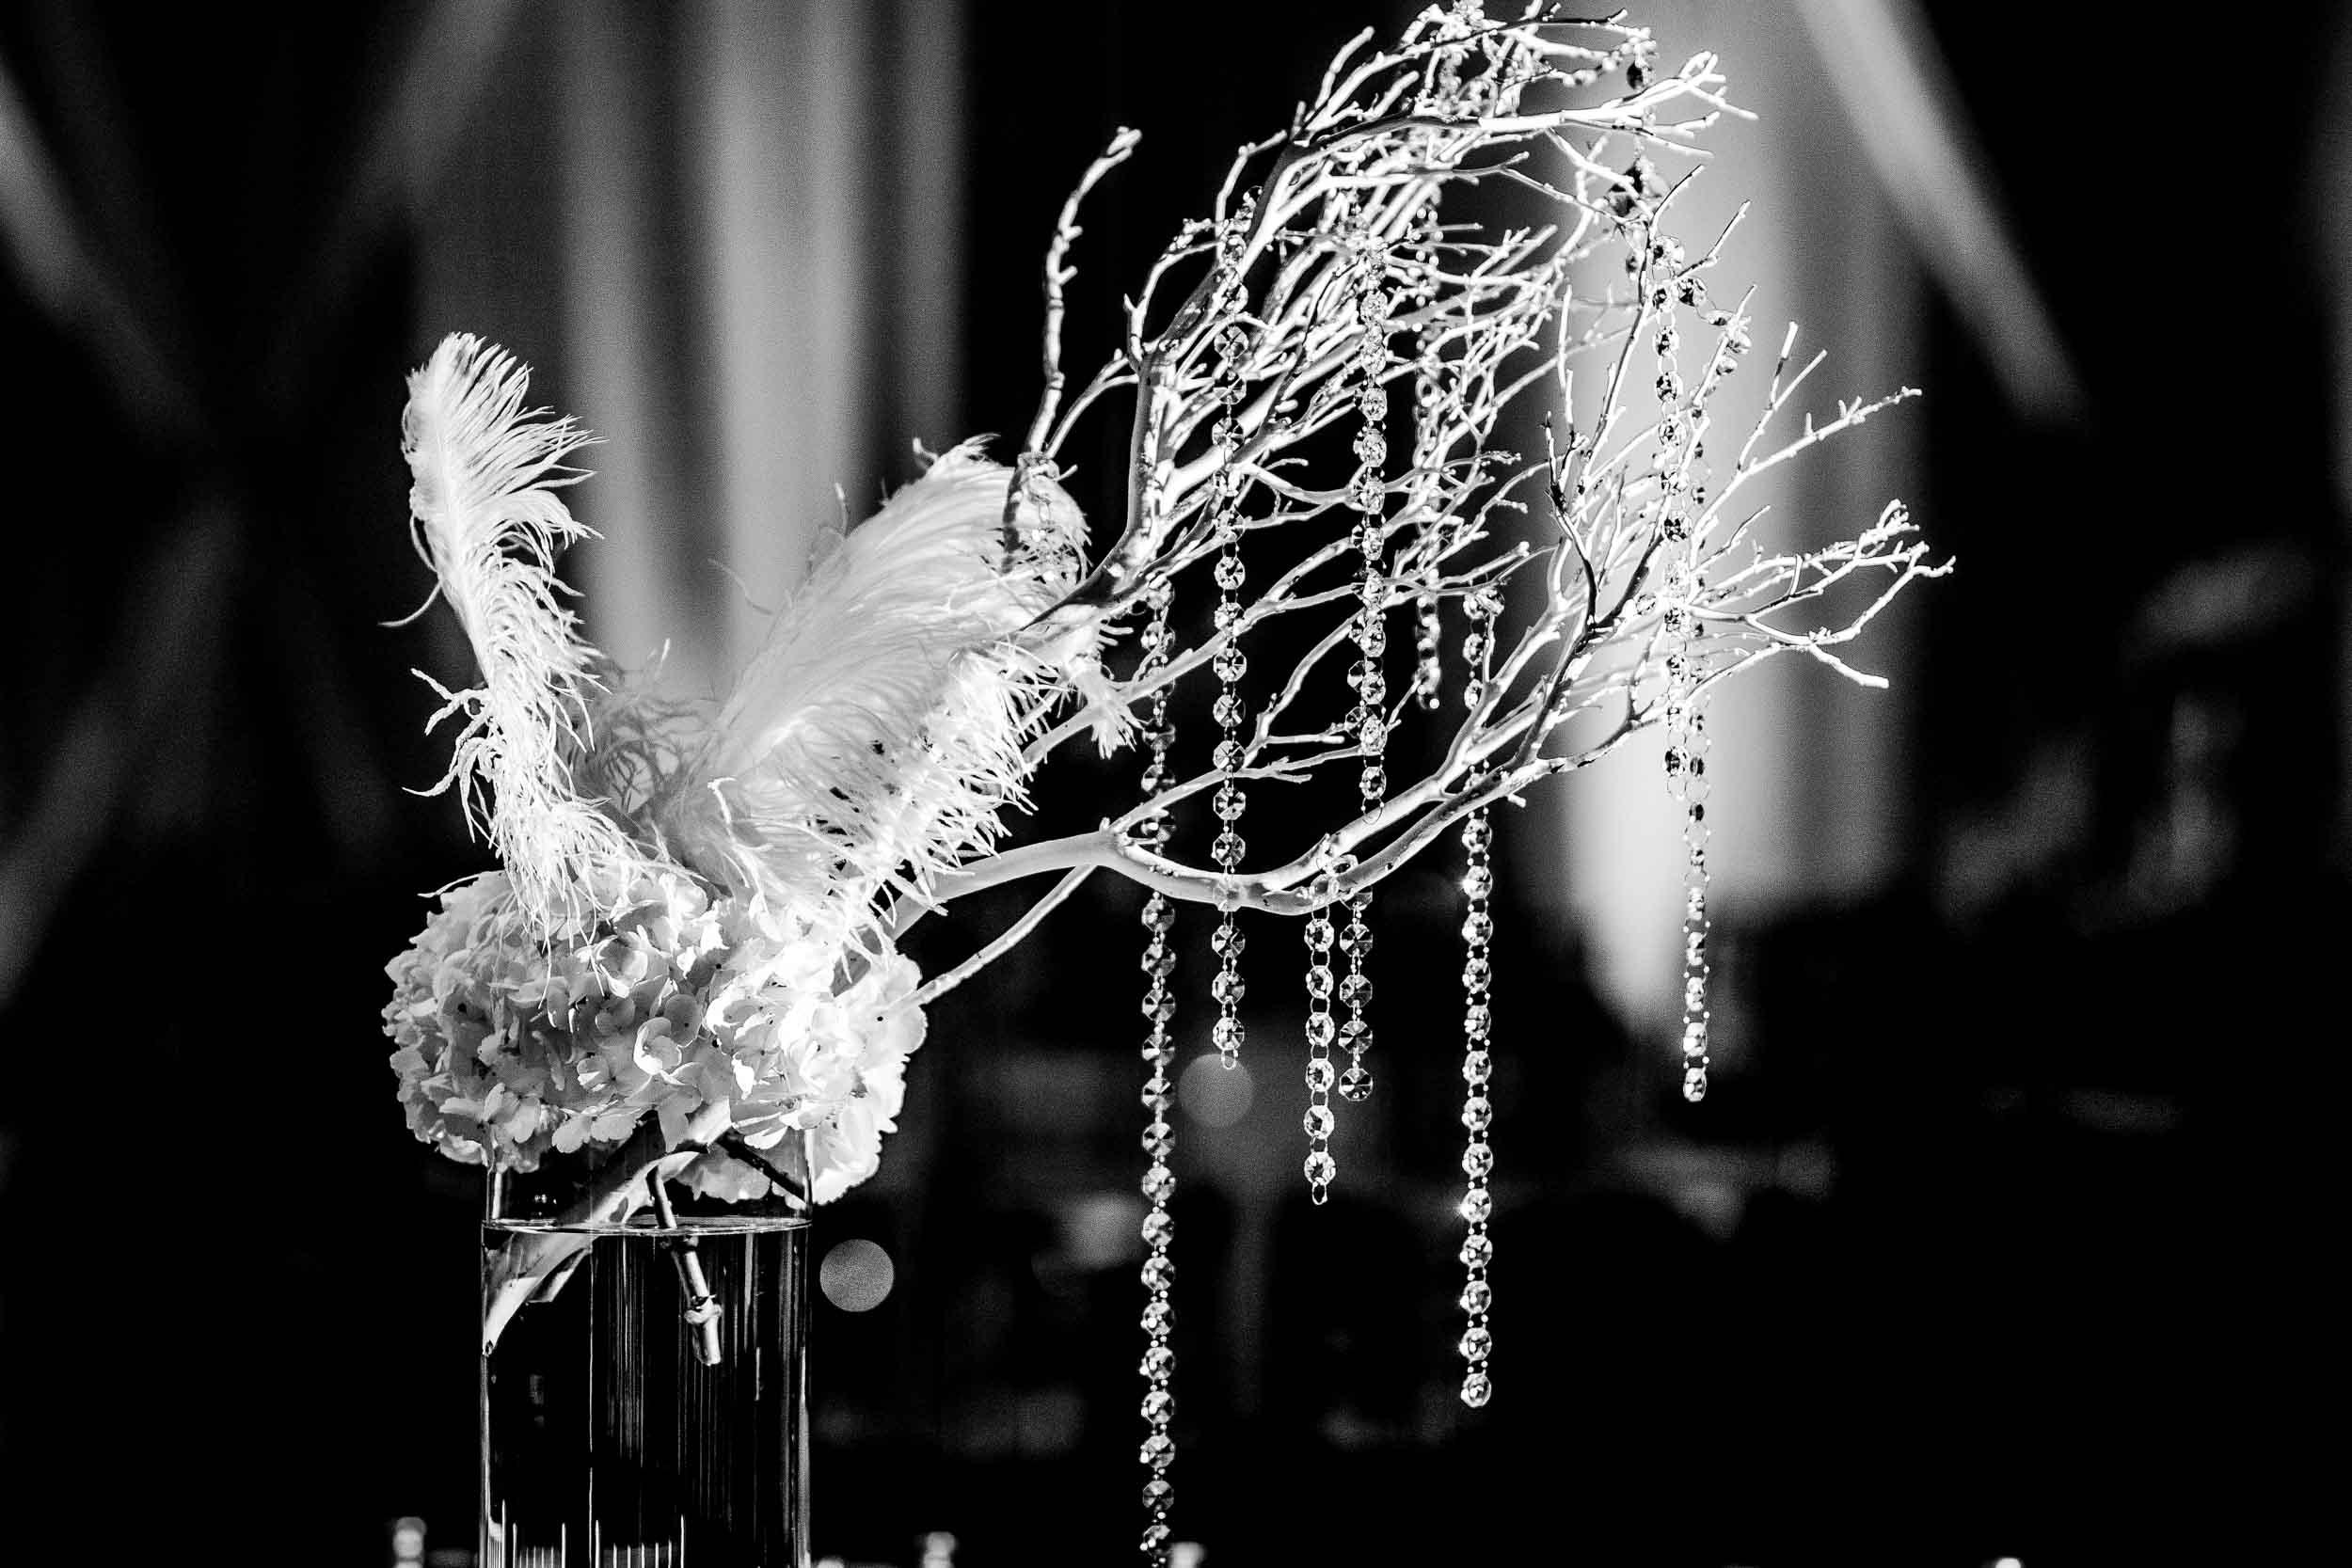 dc+metro+wedding+photographer+vadym+guliuk+photography+wedding+decorations-2020.jpg